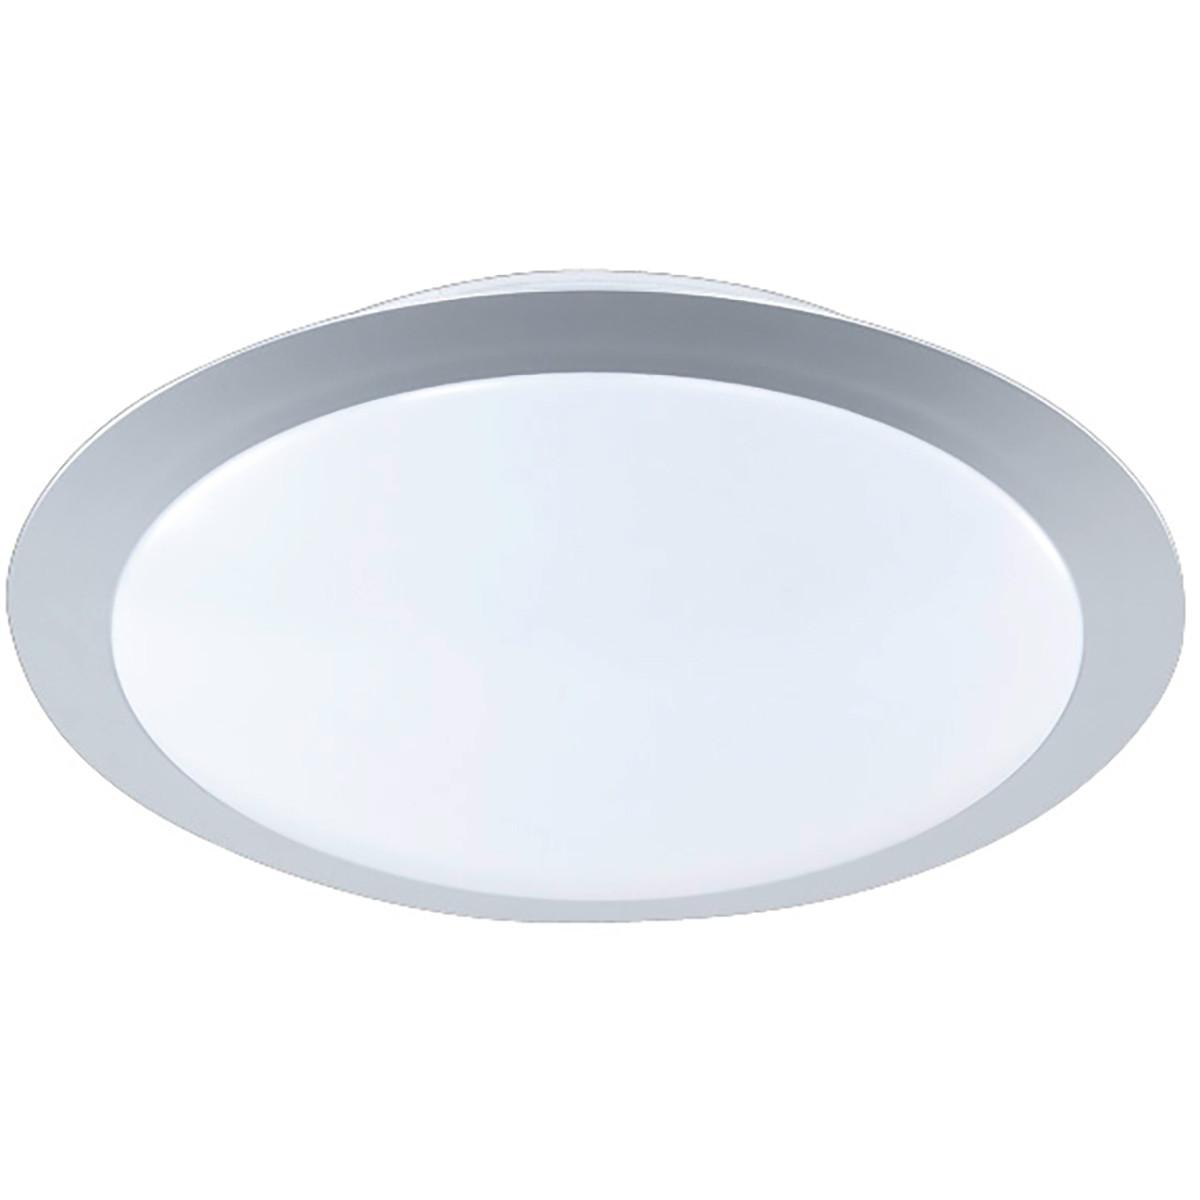 LED Plafondlamp - Plafondverlichting - Trion Ginzon - 9W - Warm Wit 3000K - Rond - Mat Titaan - Alum